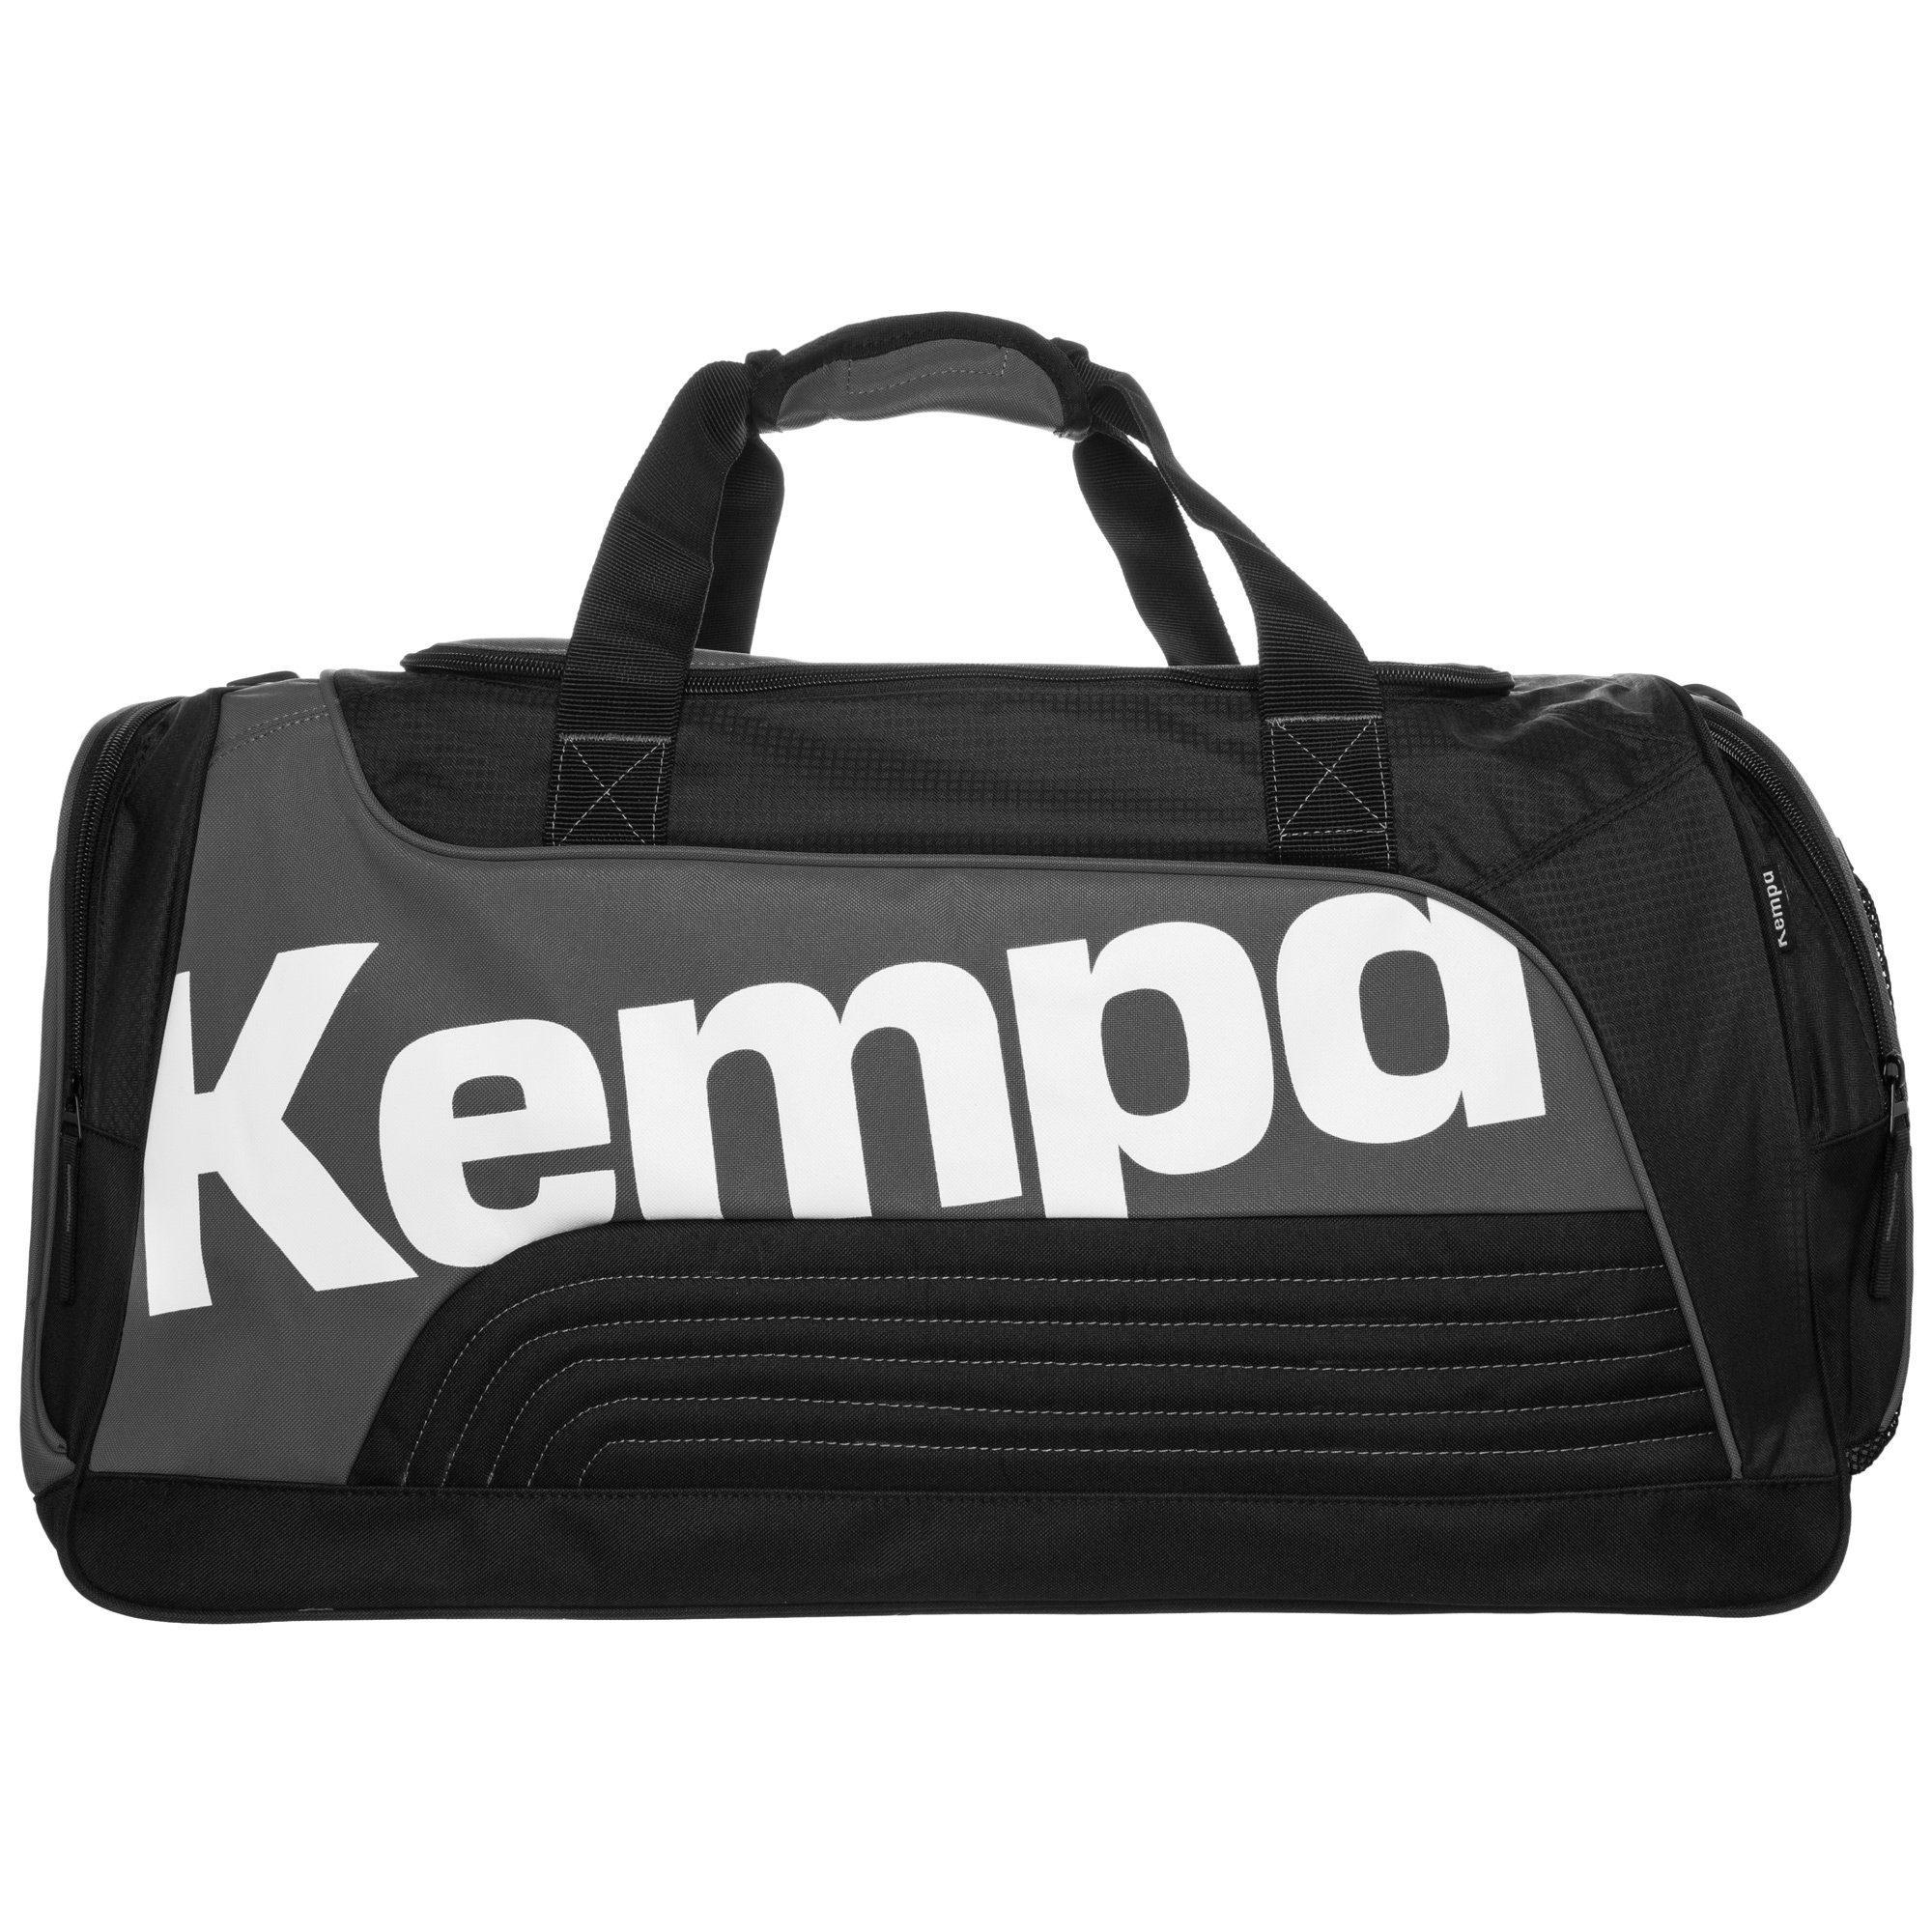 KEMPA Sportline Sportbag (35L)